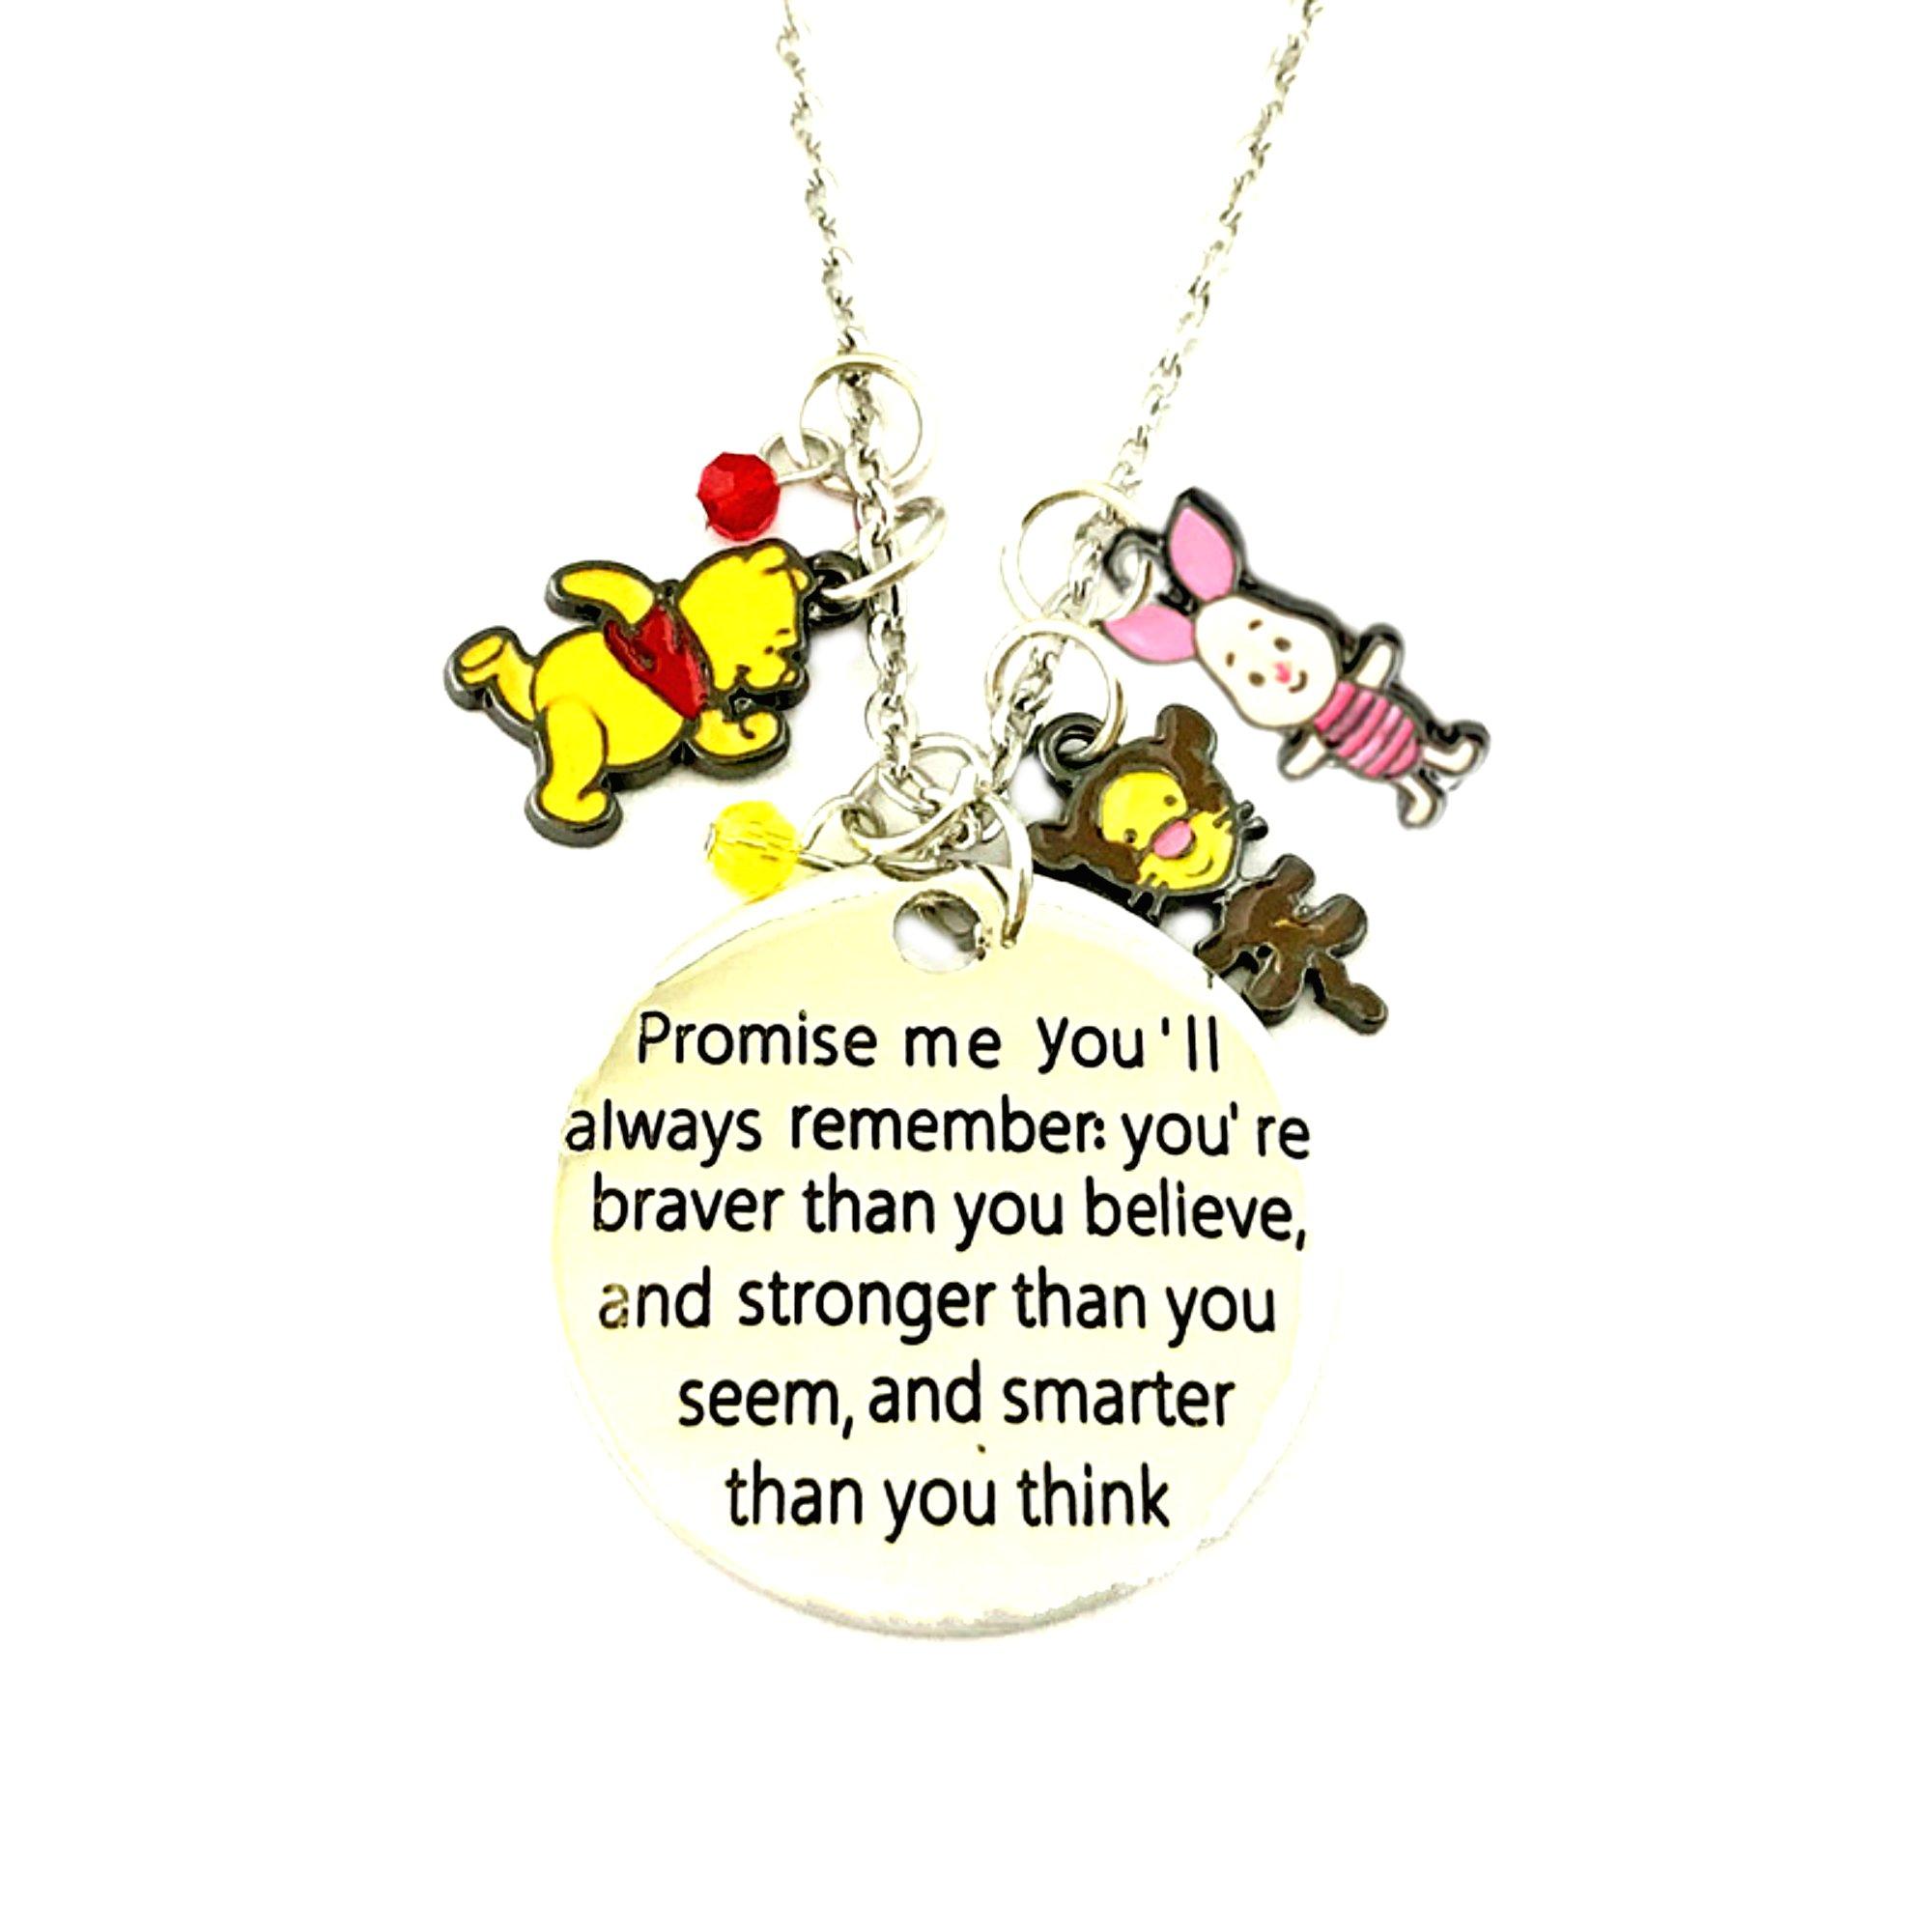 Outlander Brand Winnie the Pooh Disney Cosplay Premium Quality 18'' Pendant Necklace w/Gift Box